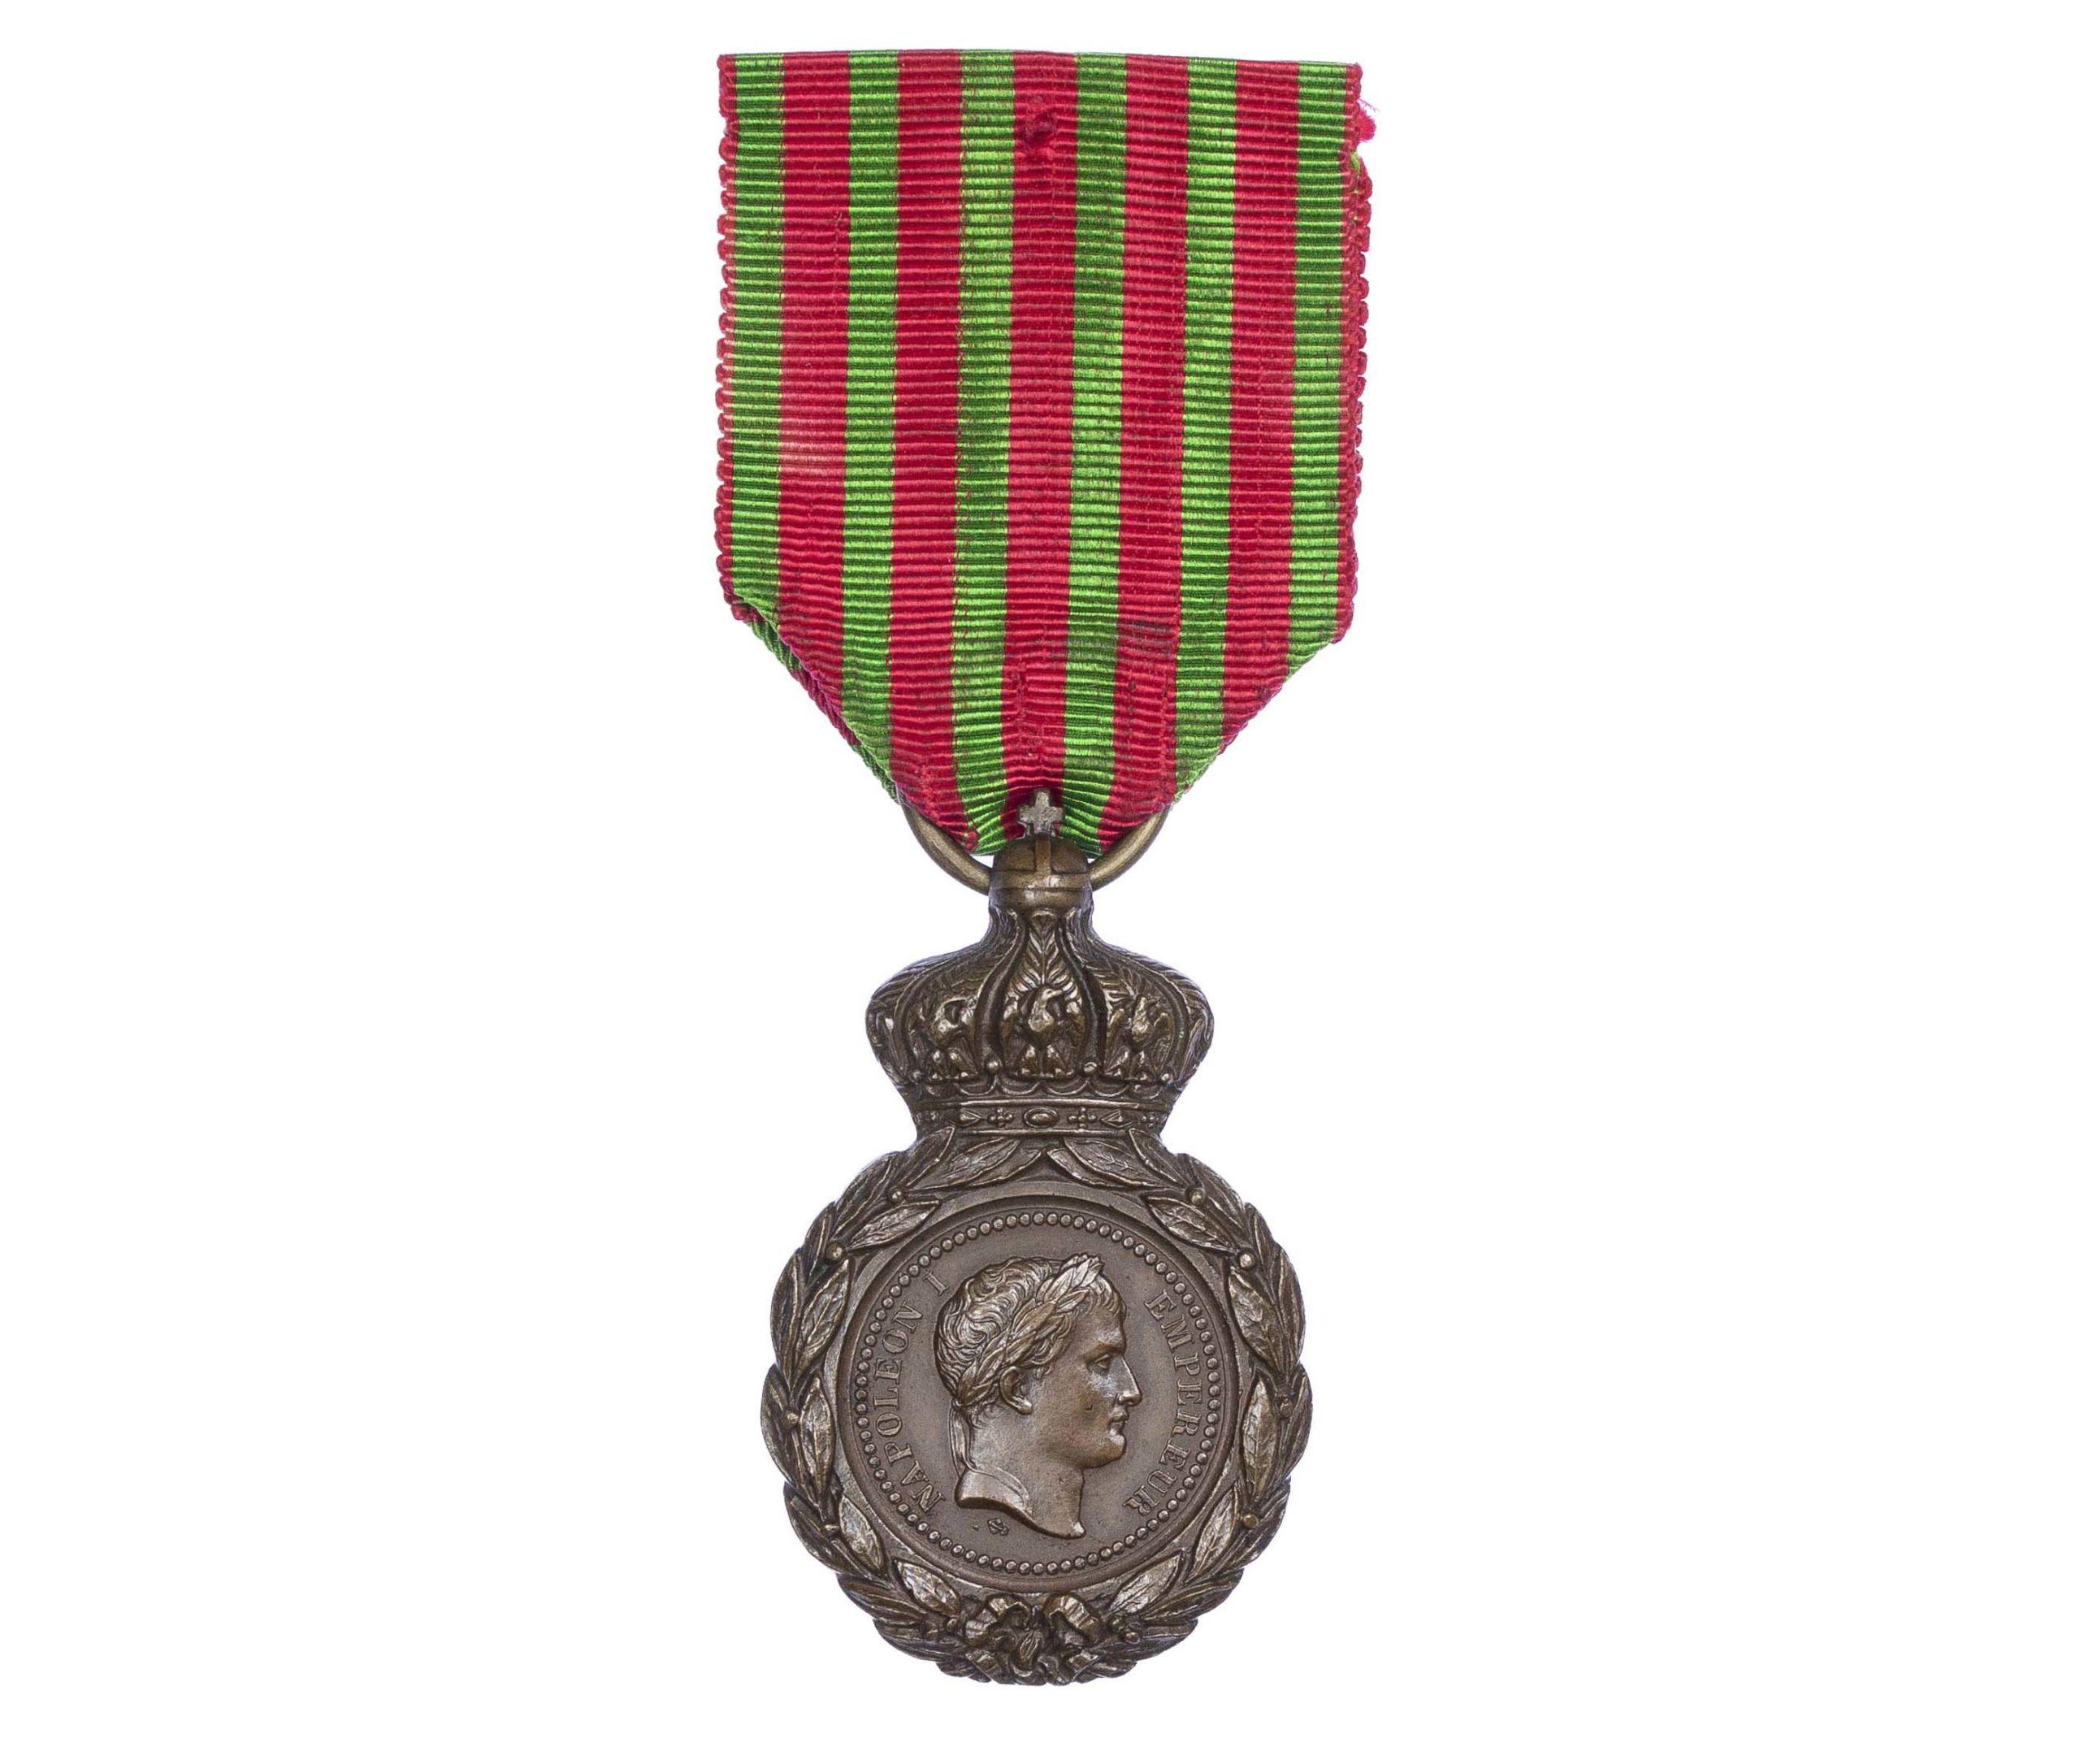 France, St. Helena Medal 1857